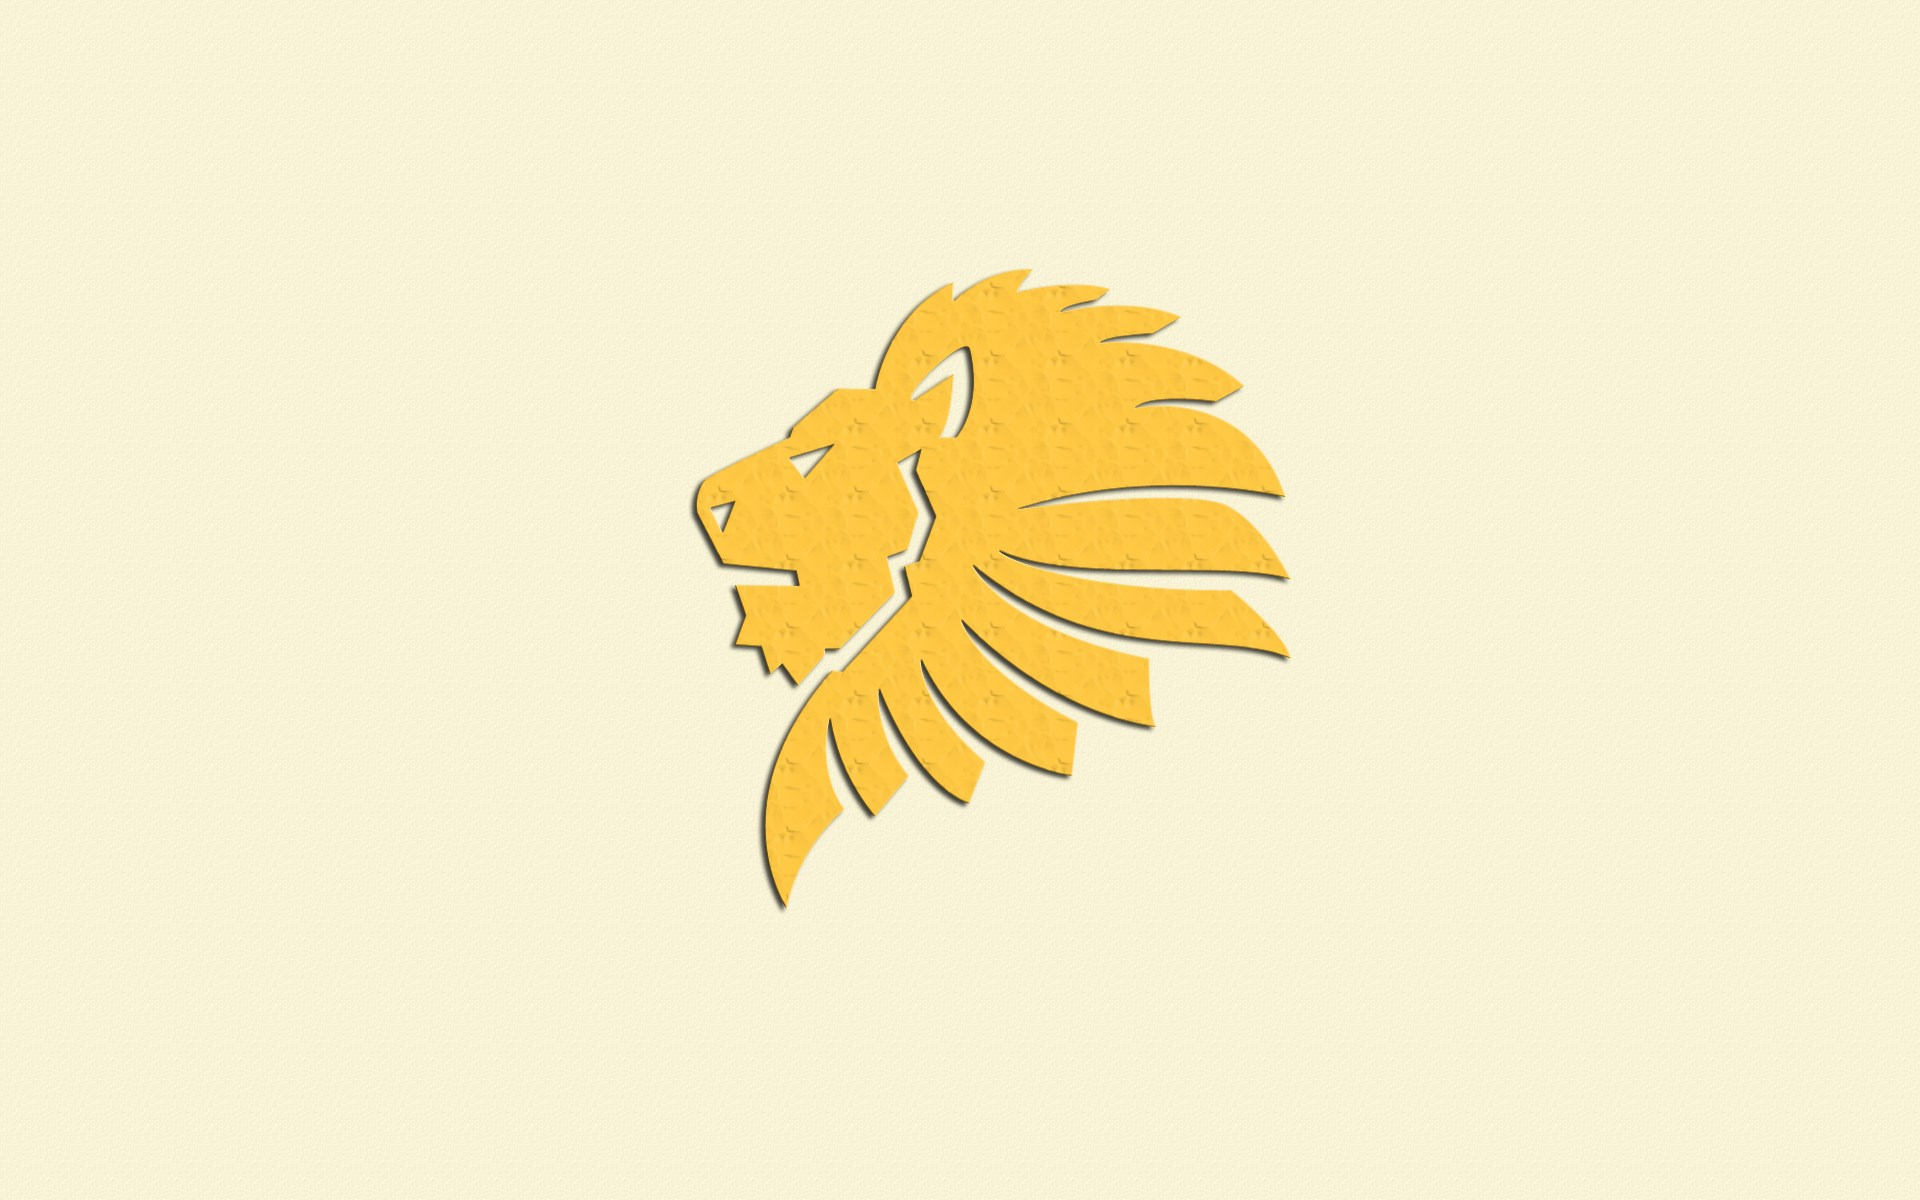 Lion Yellow Art - Illustration , HD Wallpaper & Backgrounds